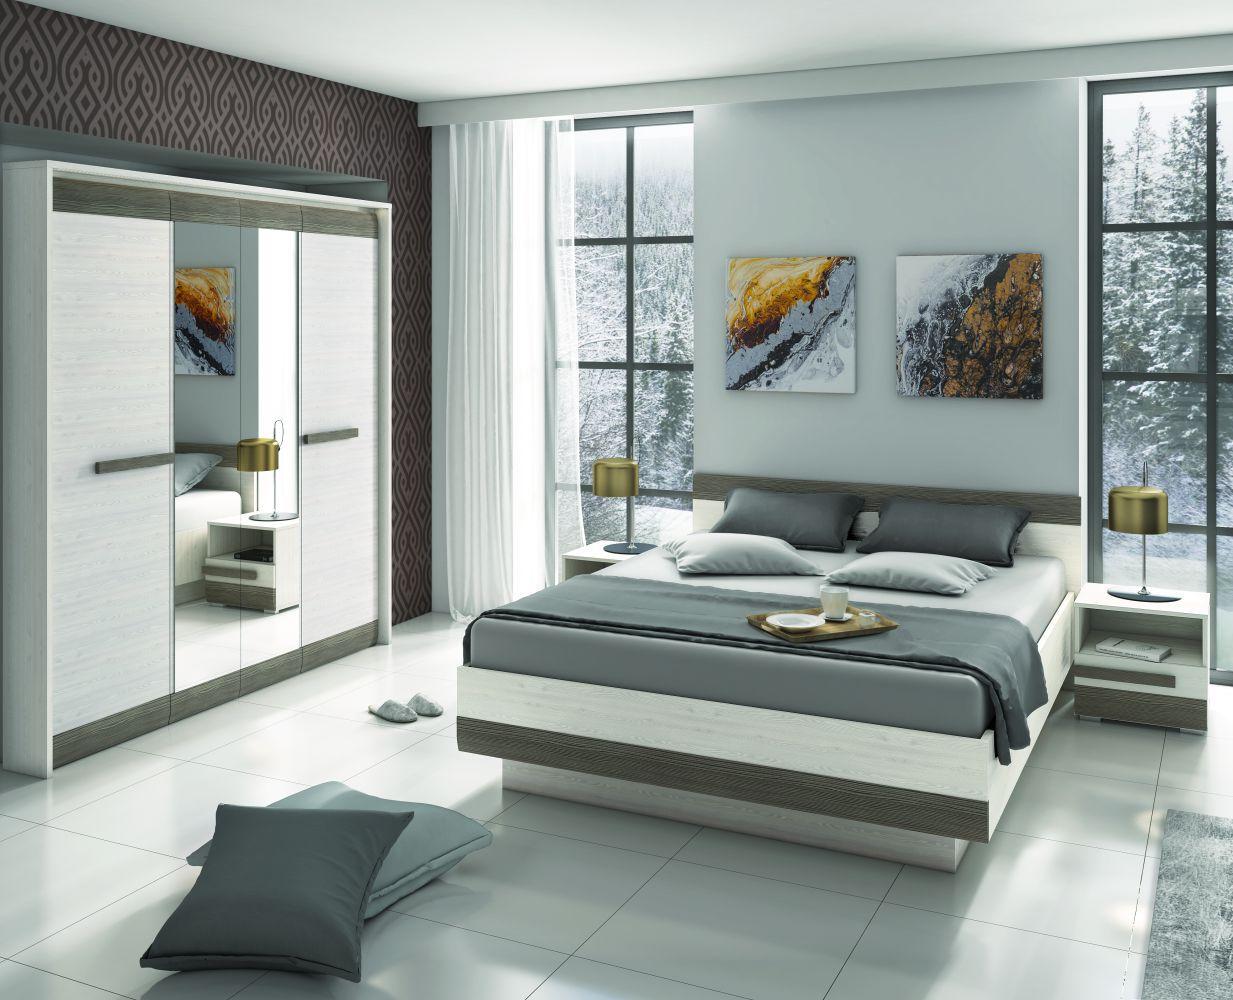 Schlafzimmer Komplett Set G Knoxville 4 Teilig Farbe Kiefer Weiss Grau